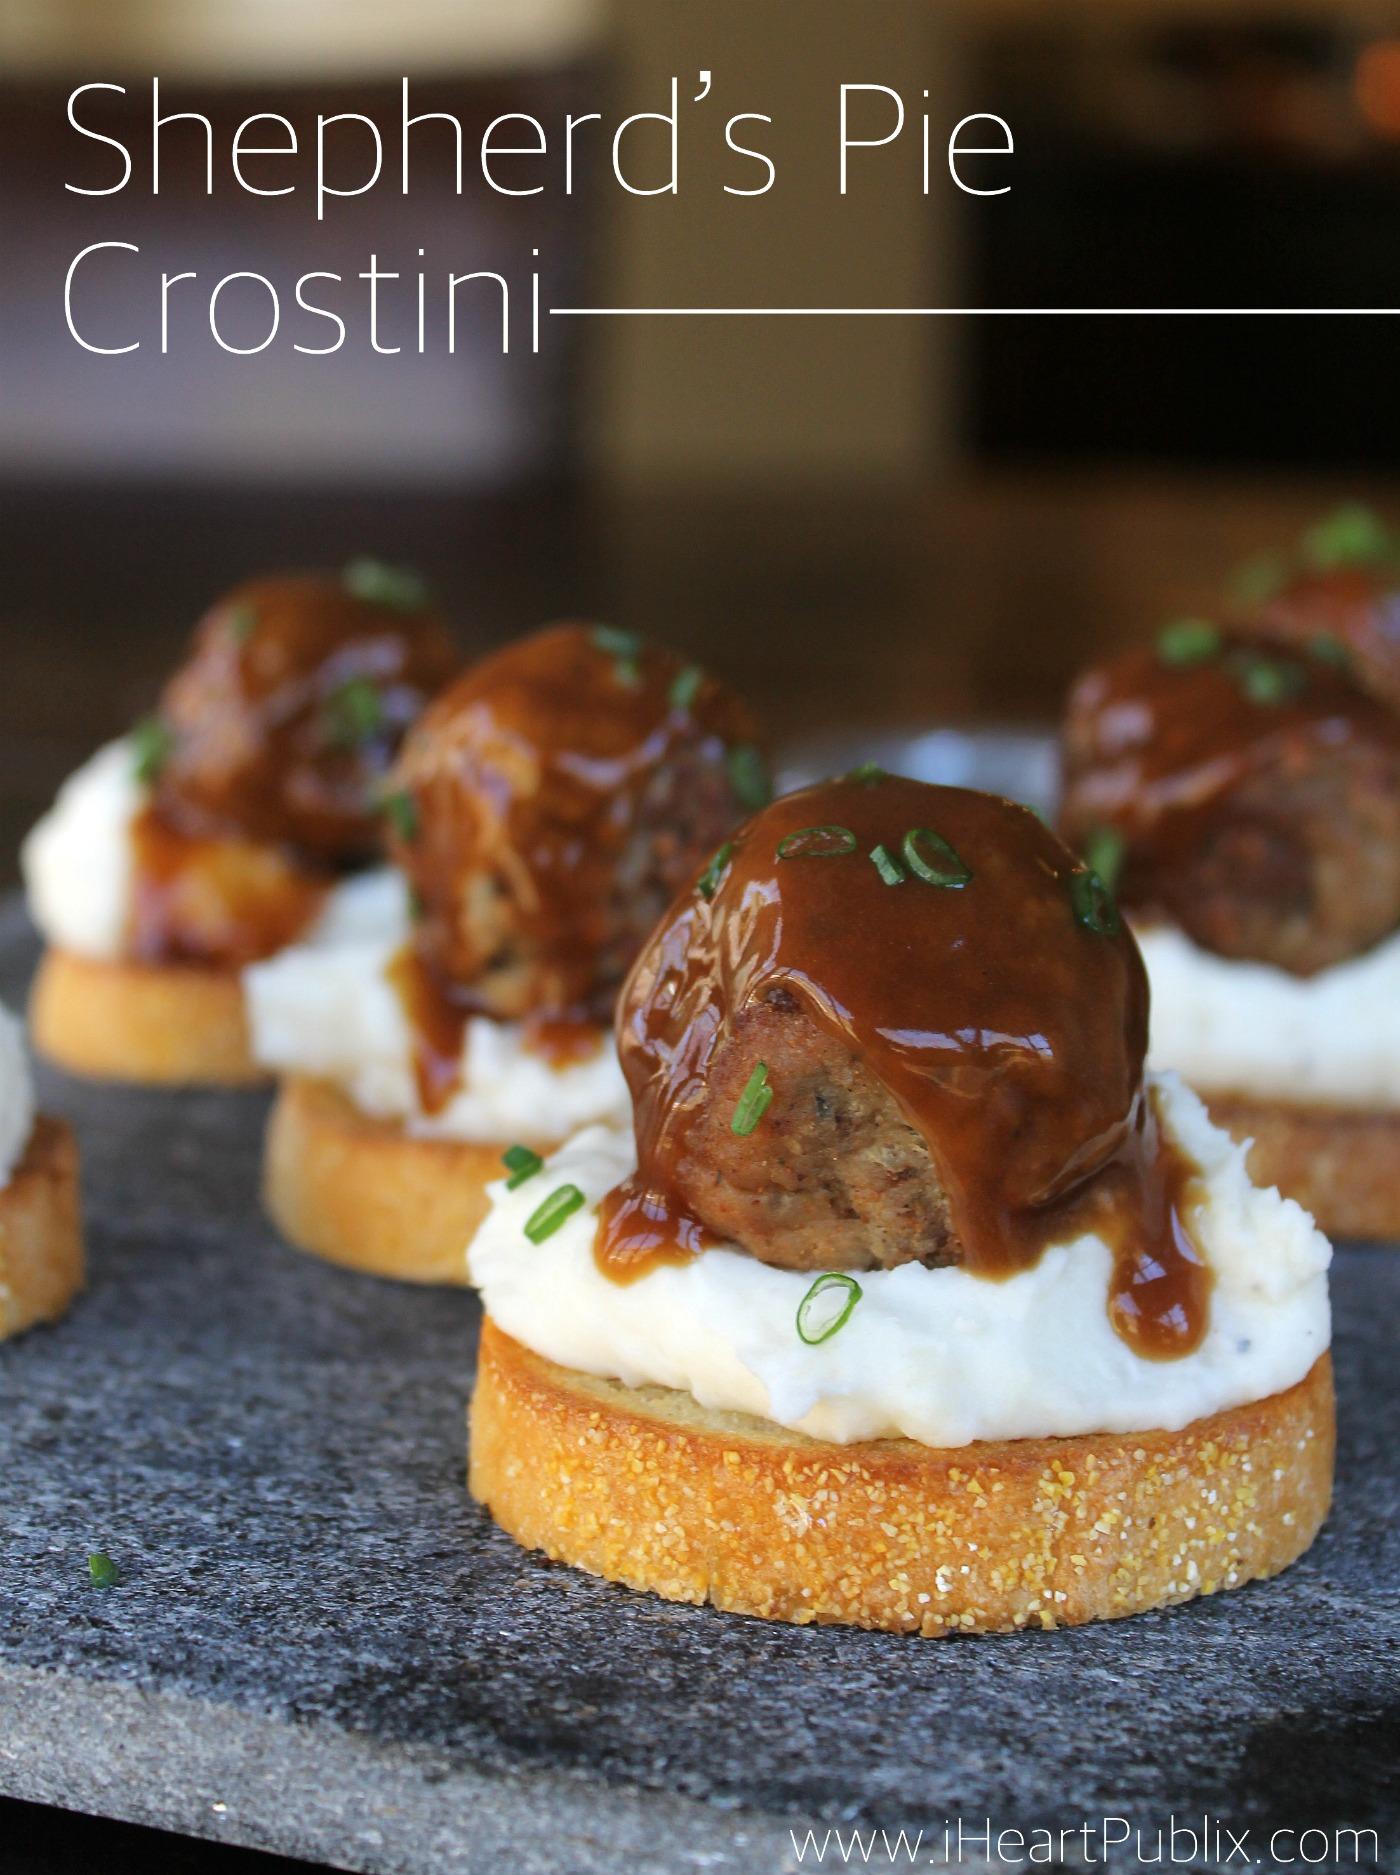 Shepherd's Pie Crostini